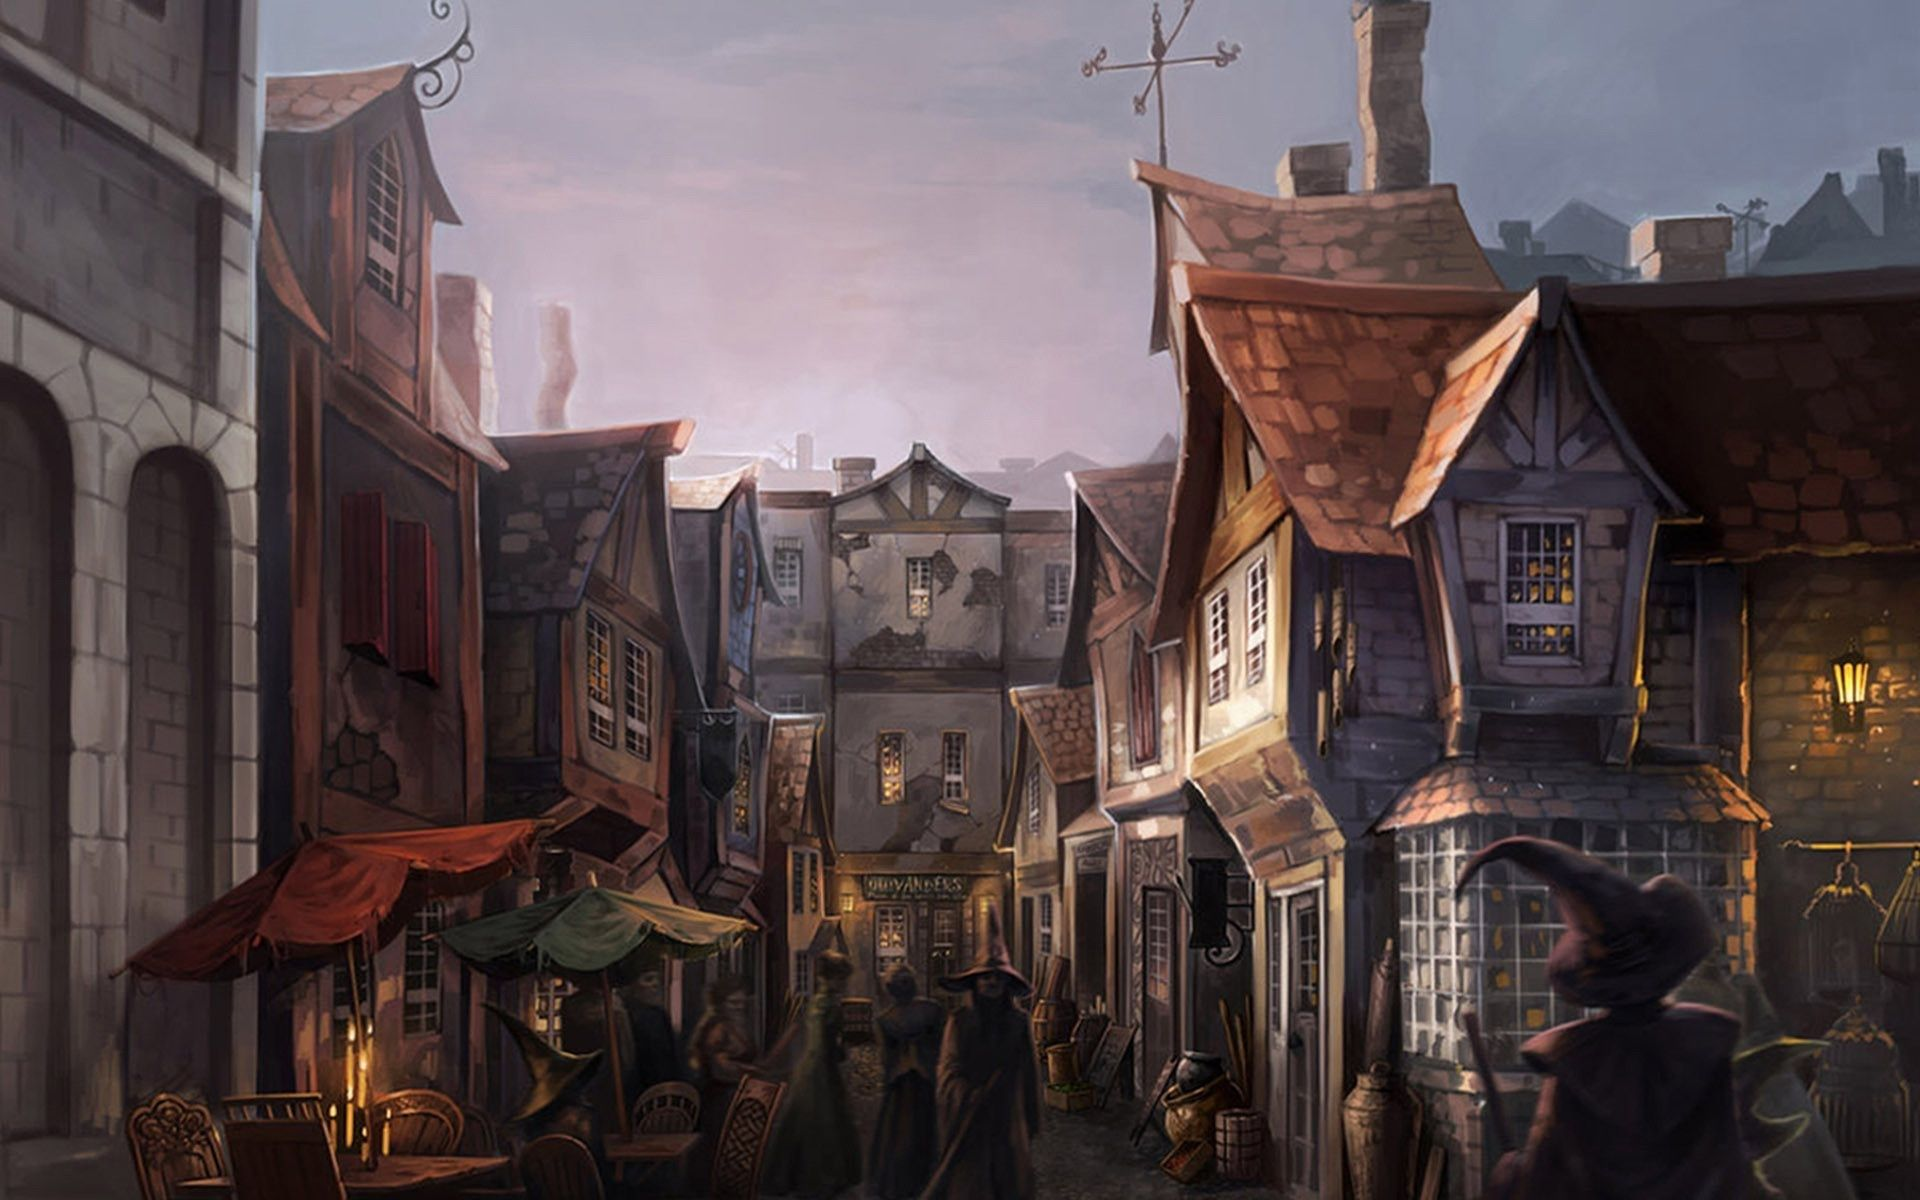 Good Wallpaper Harry Potter Imac - ab400877fe3d24117ad68fc00d0718b5  Picture_94153.jpg